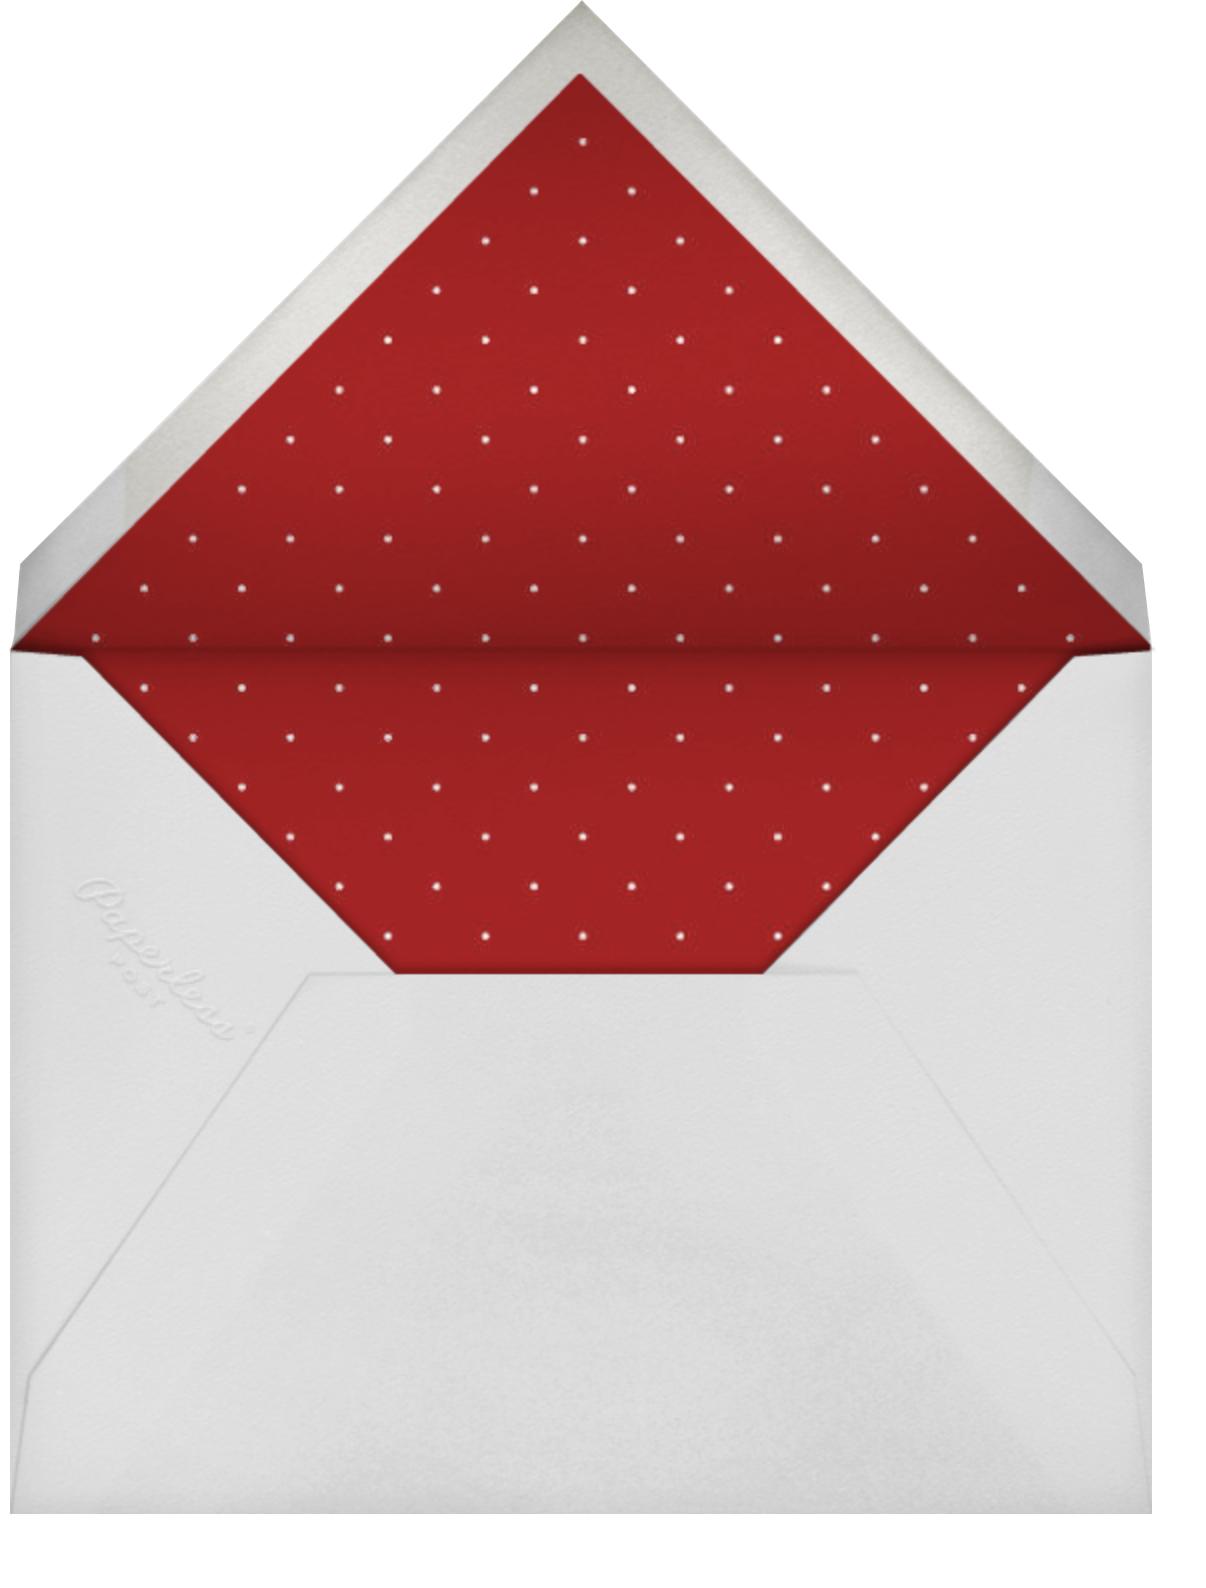 Ornaments in a Box - Mr. Boddington's Studio - Christmas party - envelope back